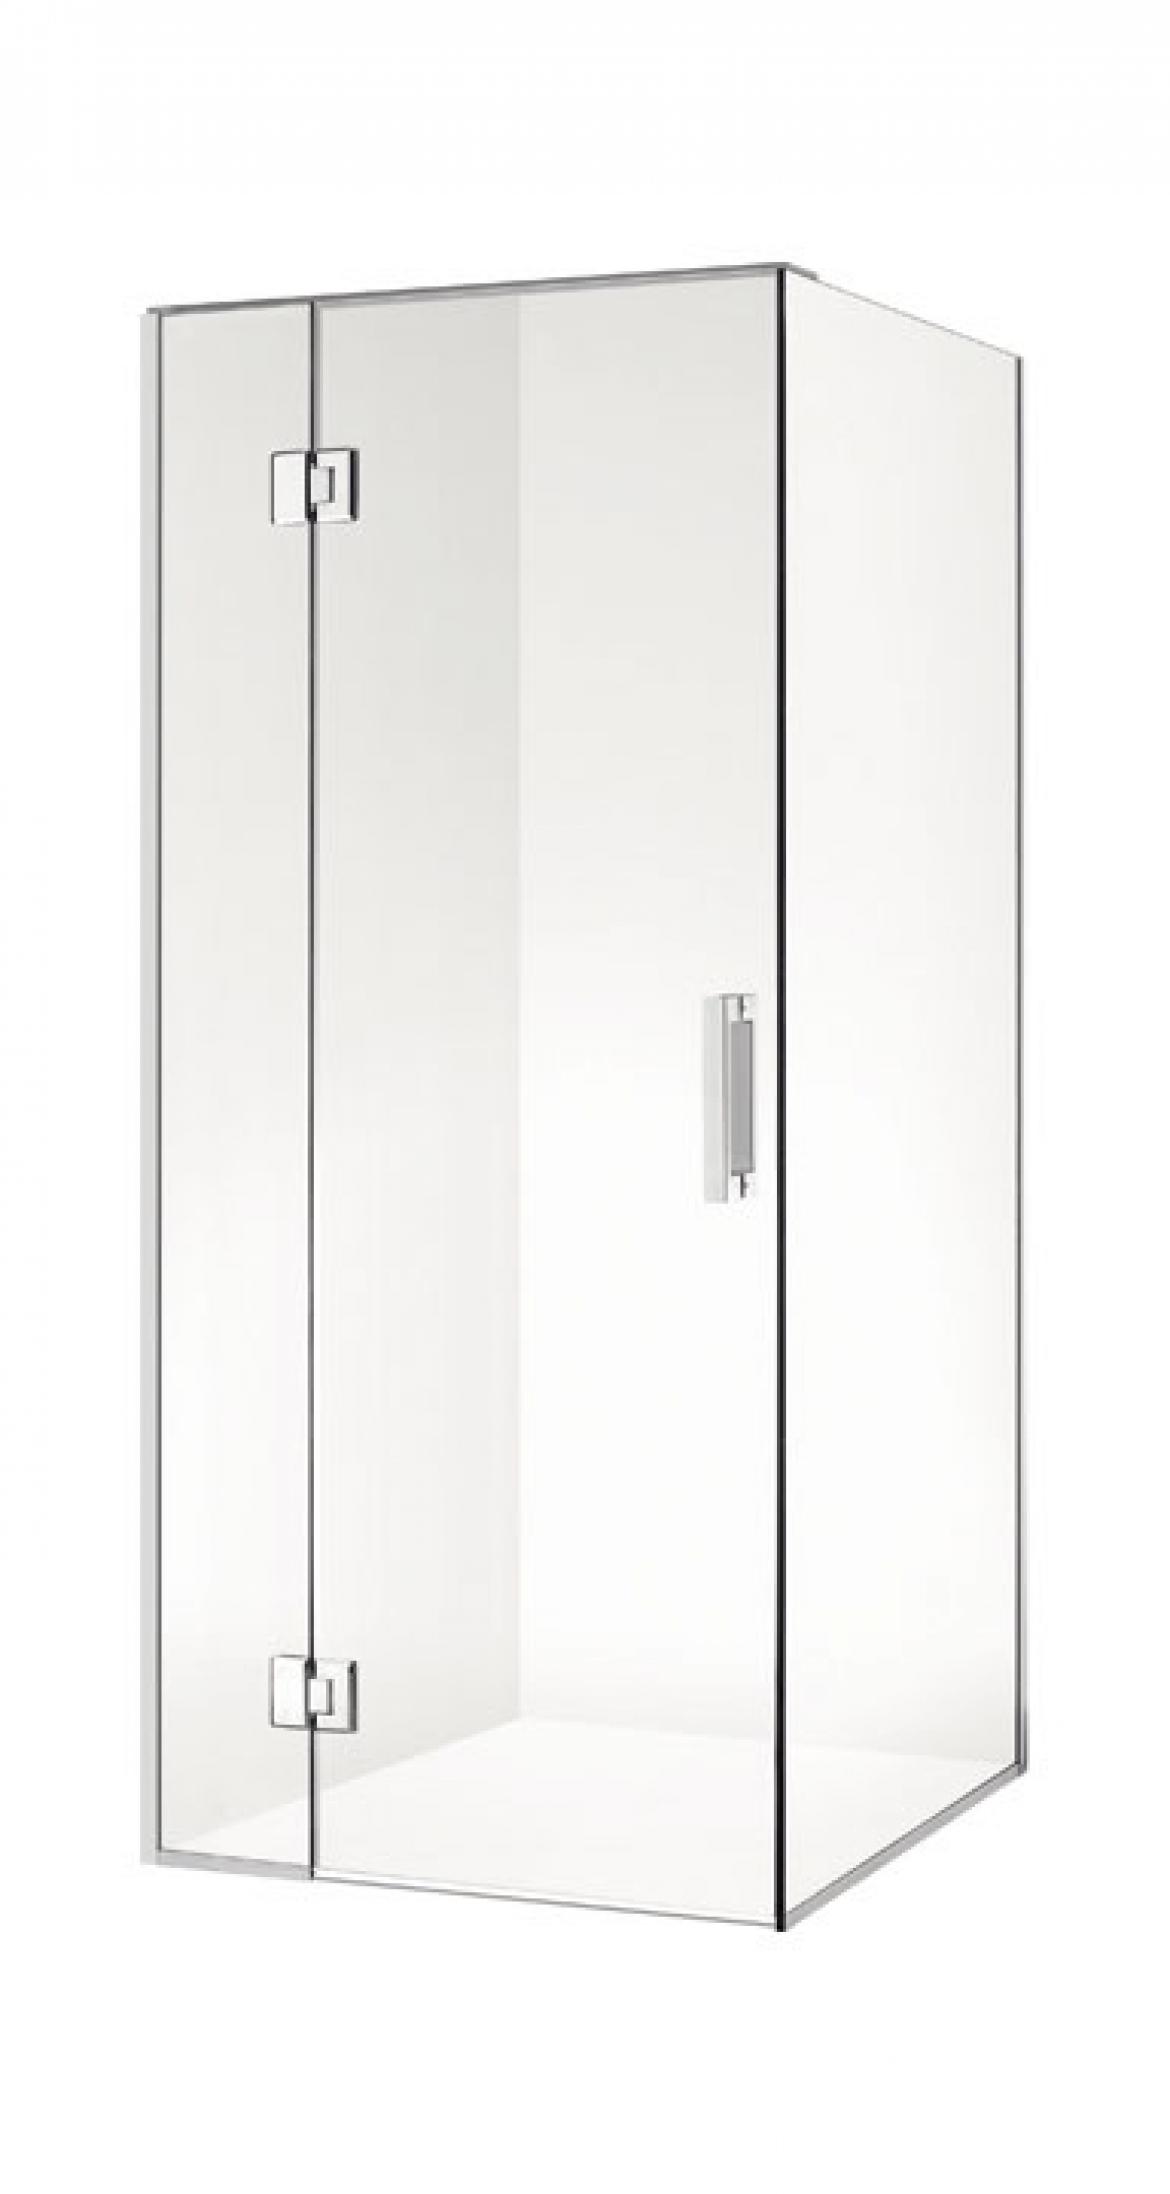 Frameless Shower Screen [900 x 900 mm]